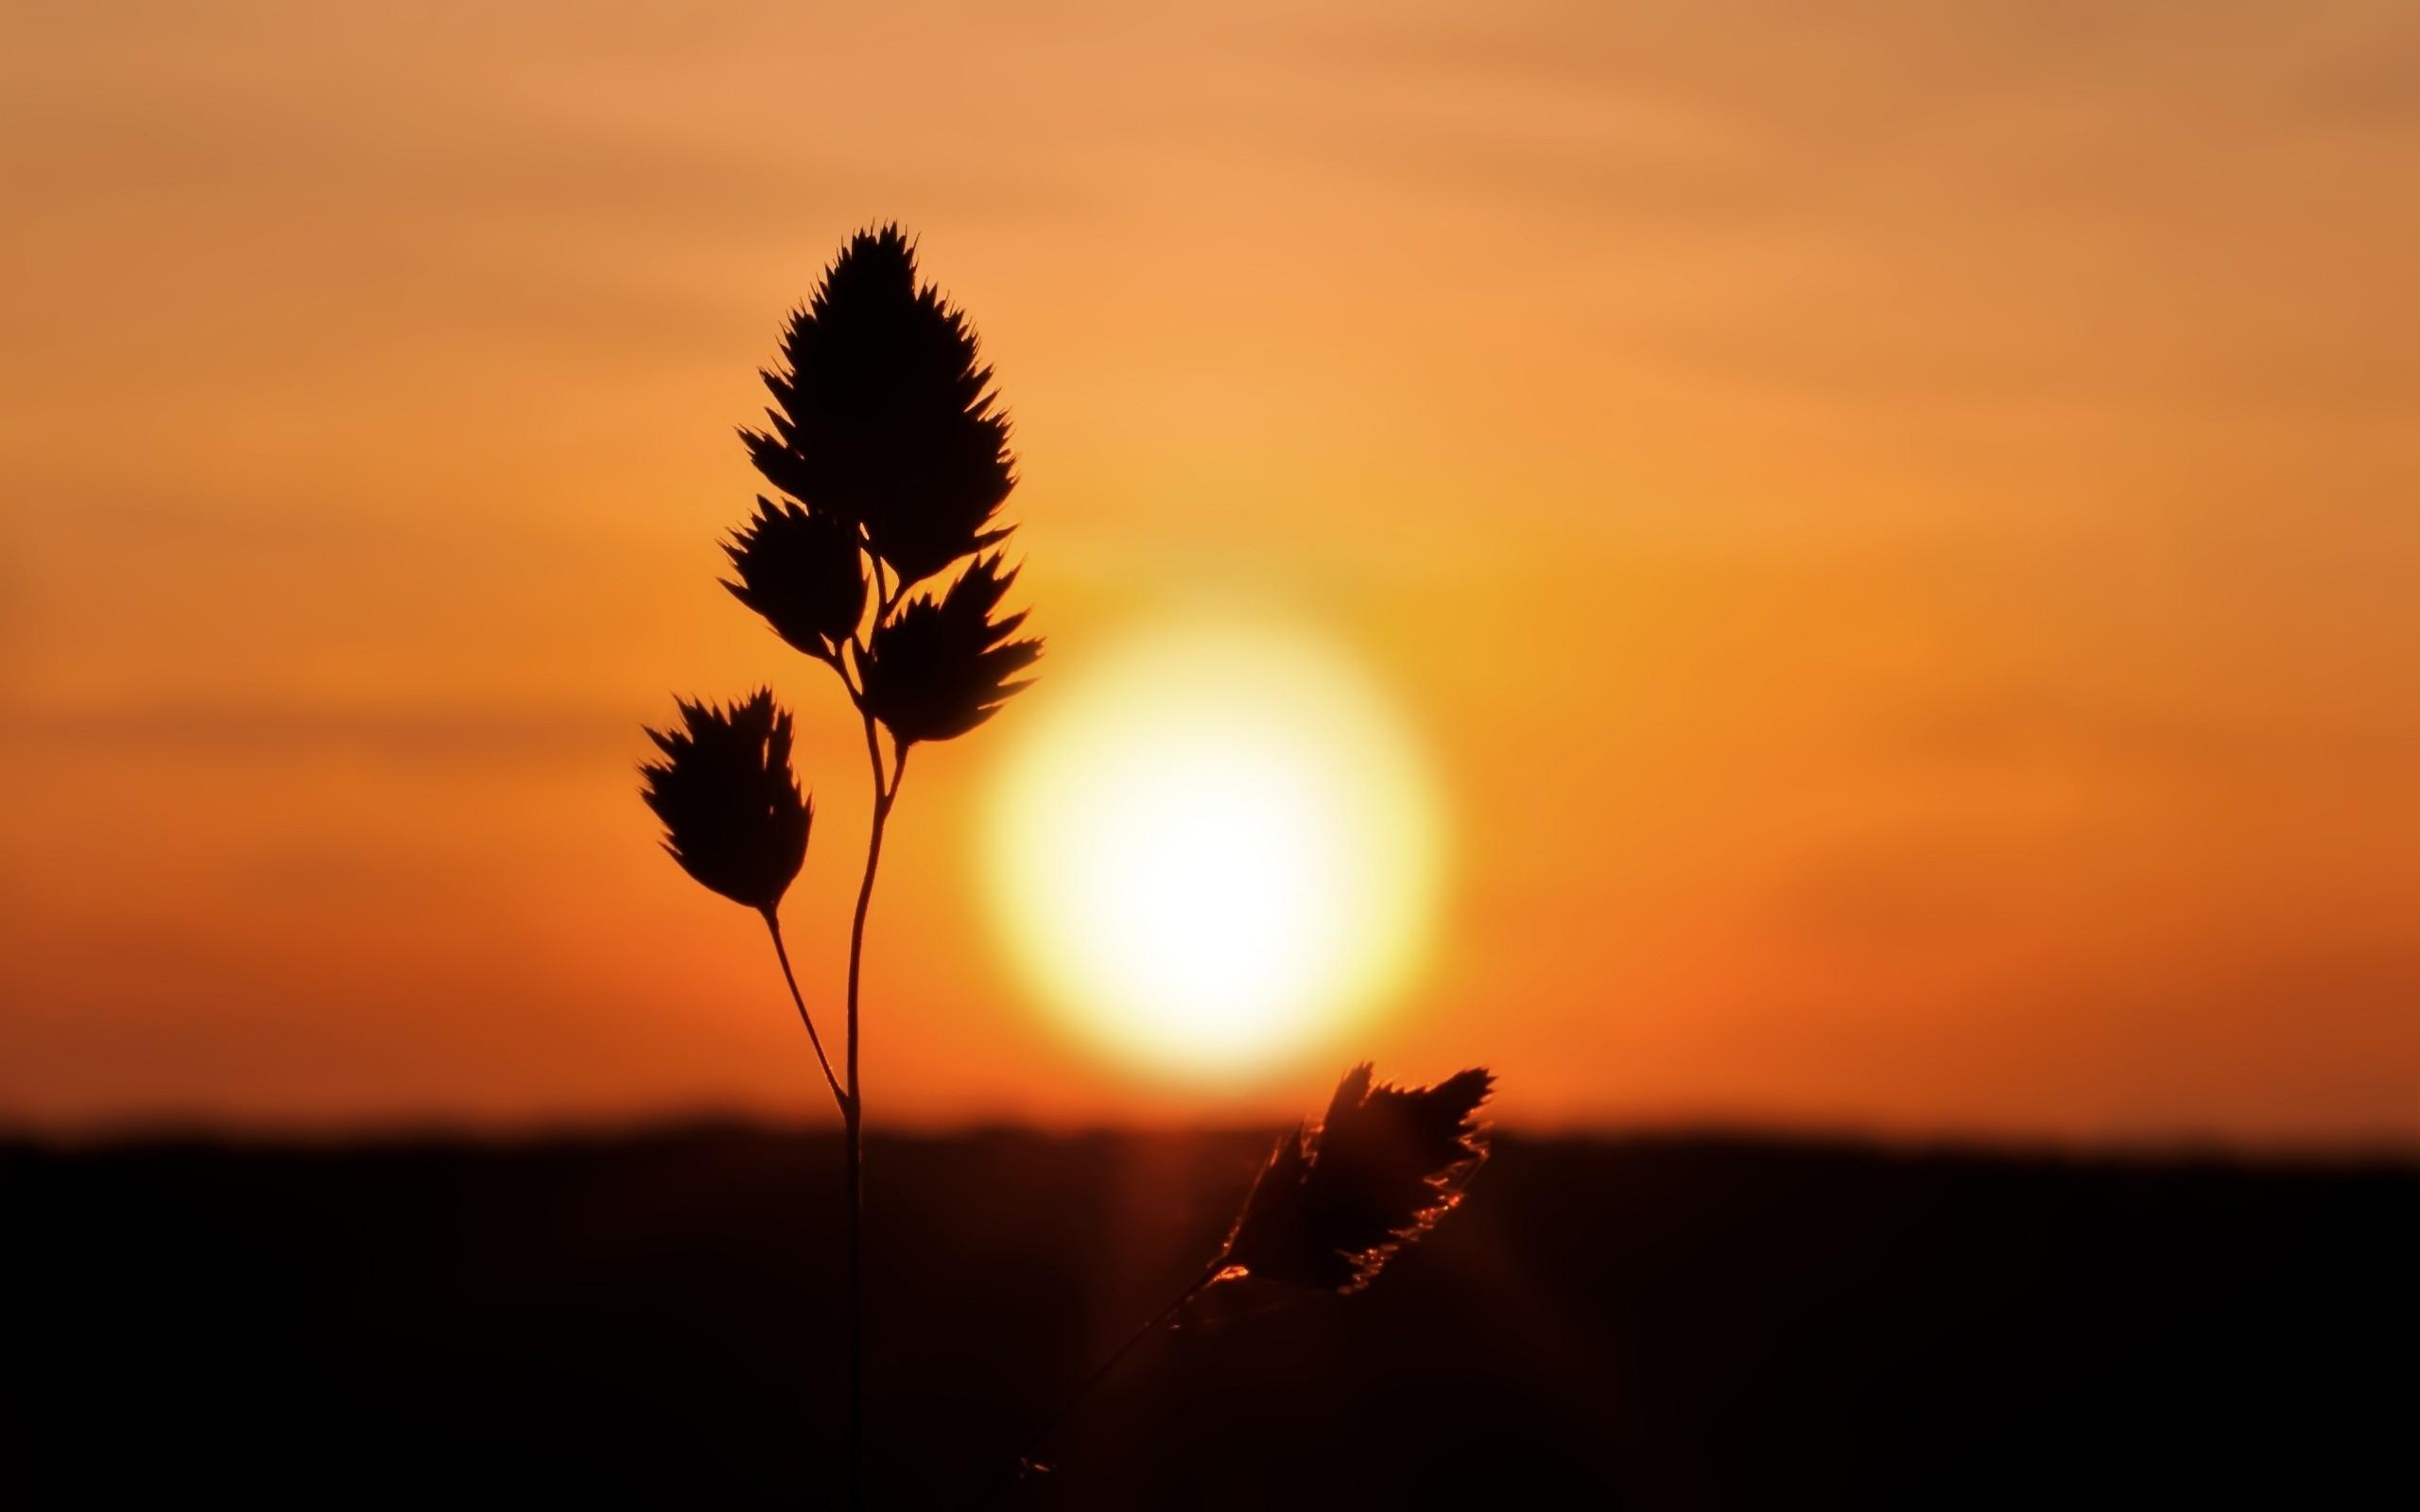 Sunsets sunrise landscapes nature 2560x1600